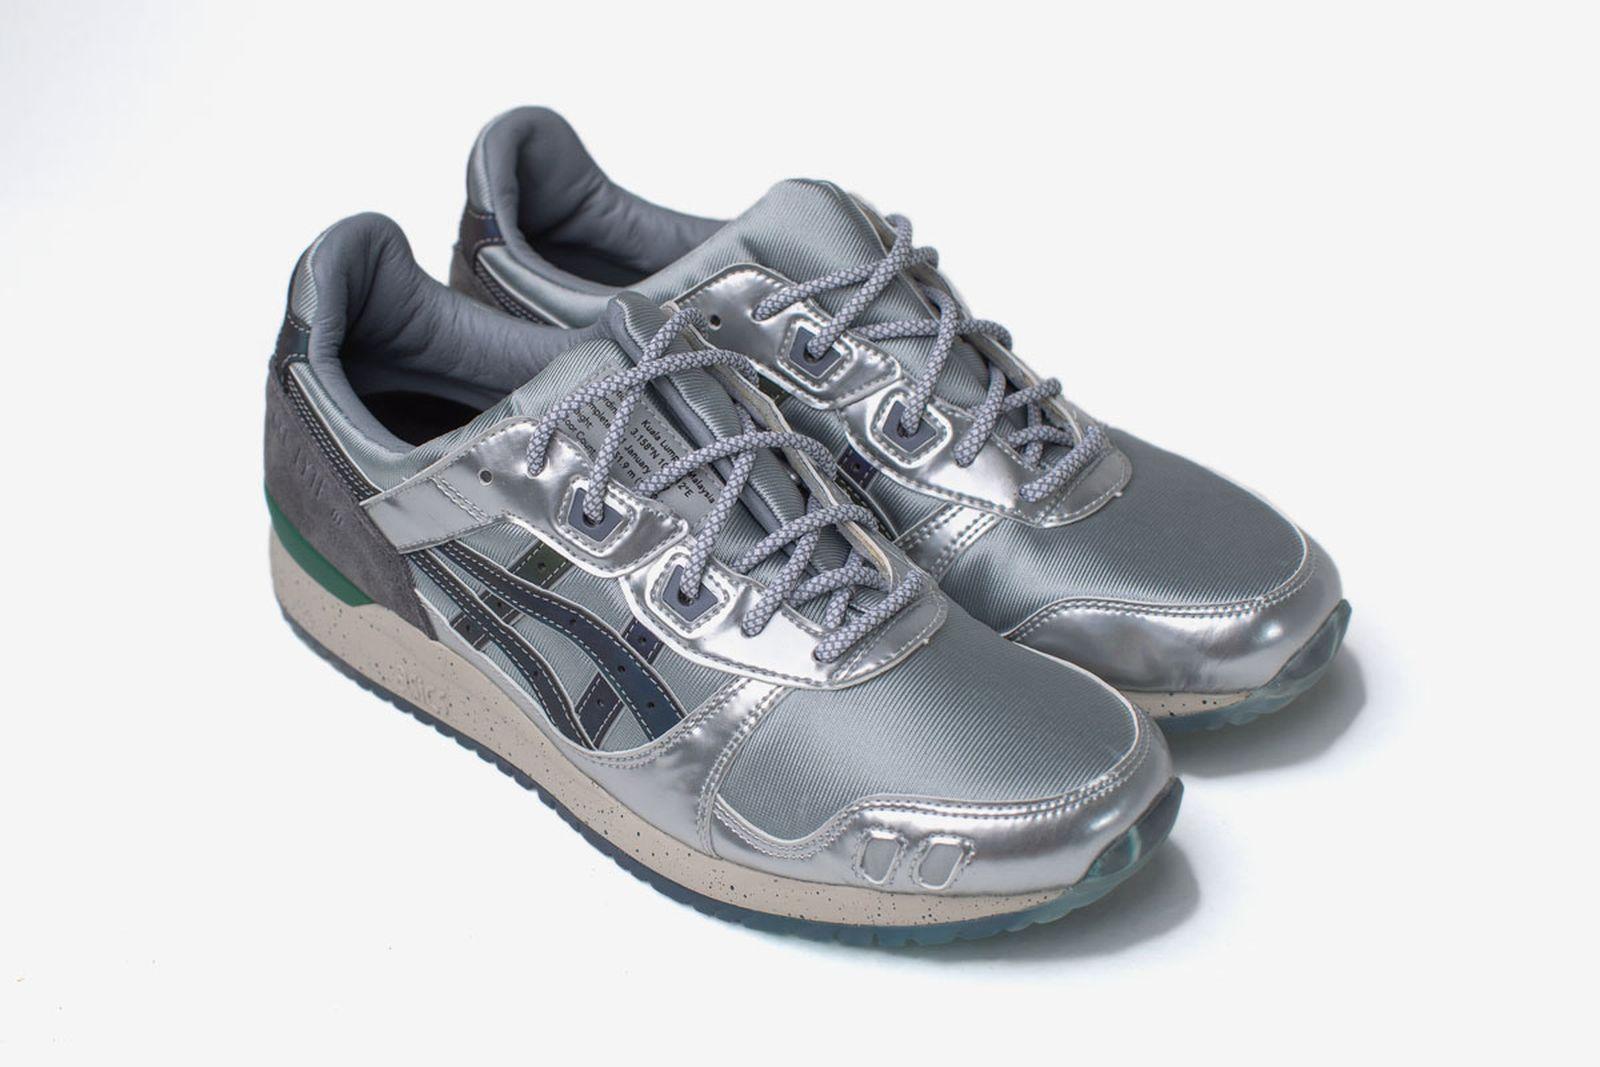 sneakerlah-asics-gel-lyte-3-petronas-twin-towers-release-date-price-07